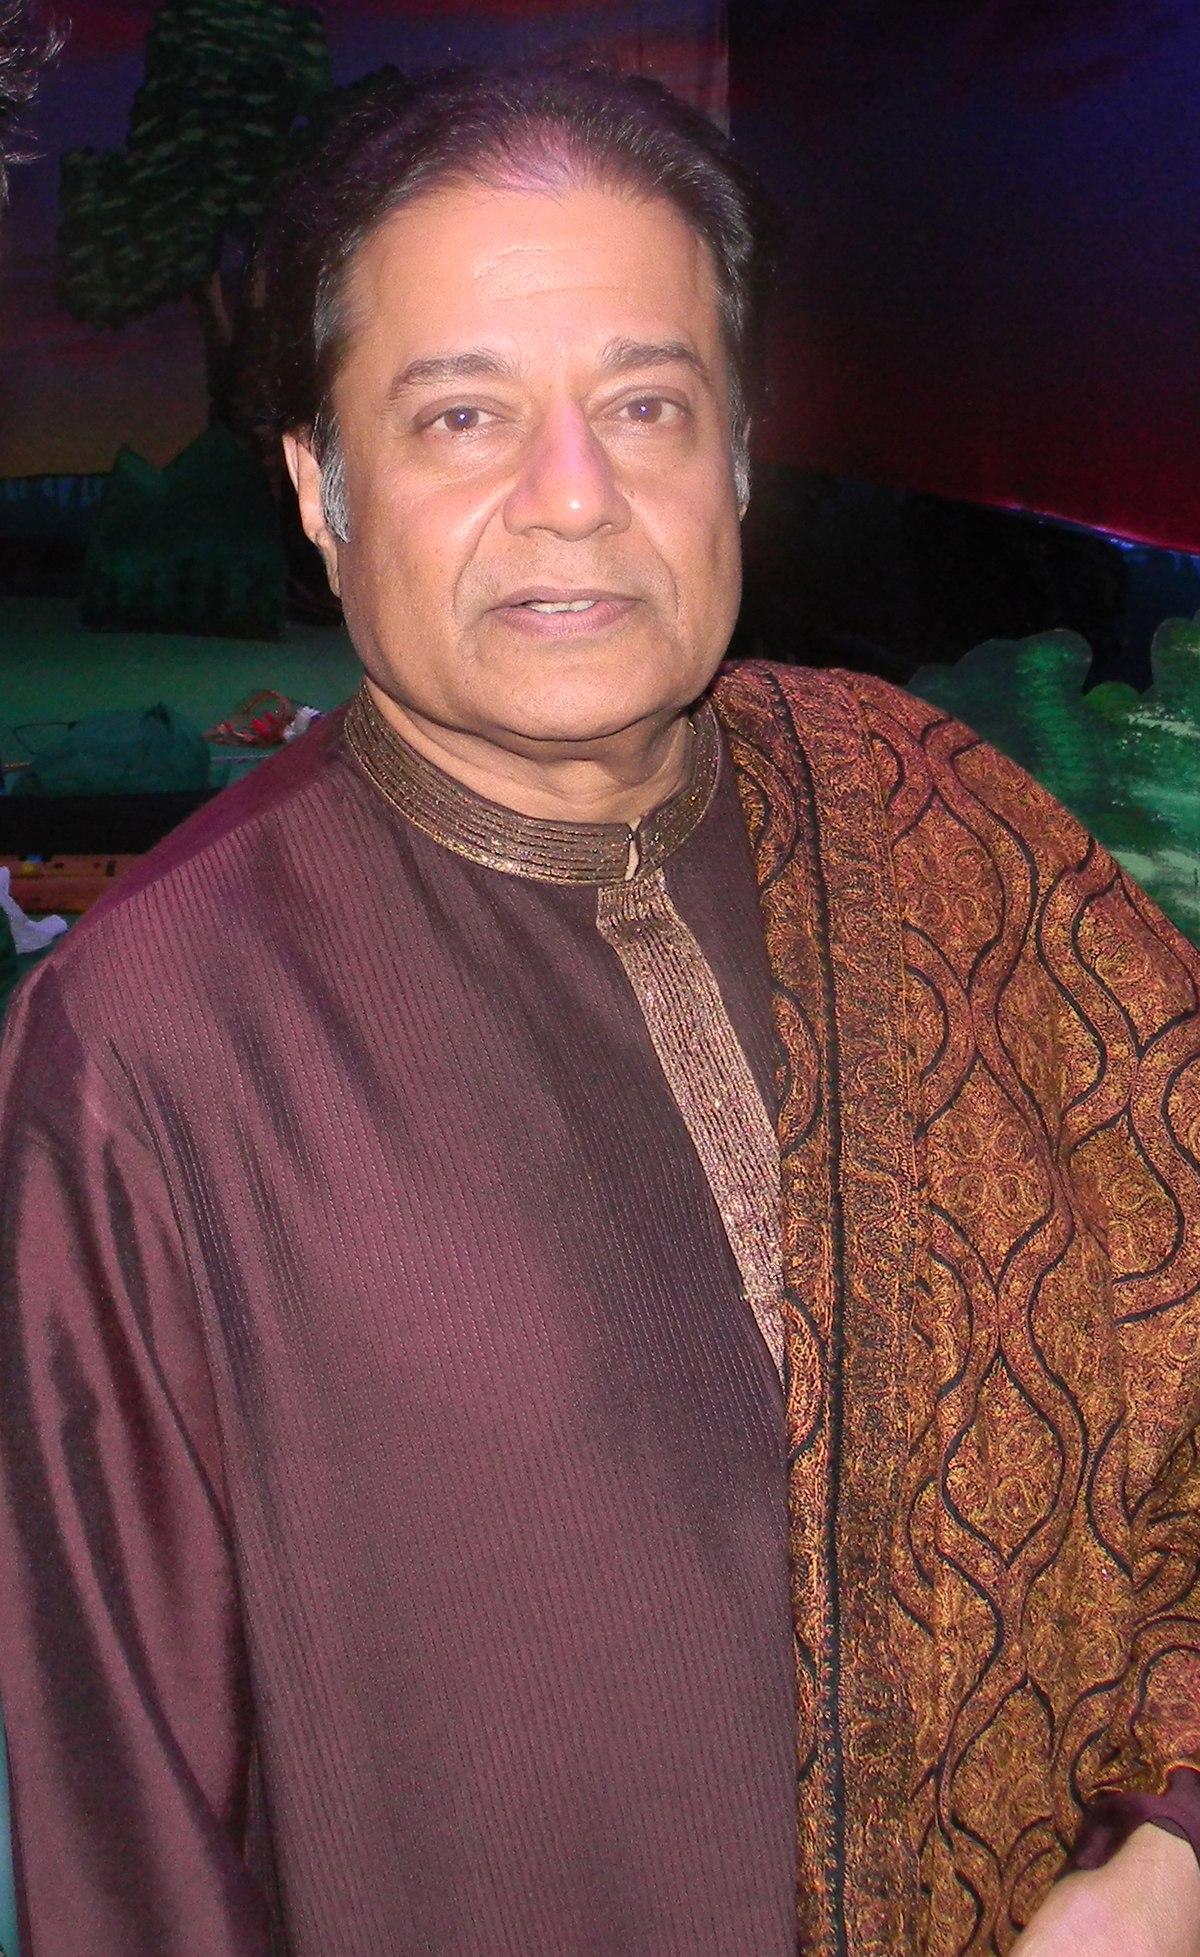 Sri Sathya Sai Baba Teachings - Radio Sai Global Harmony